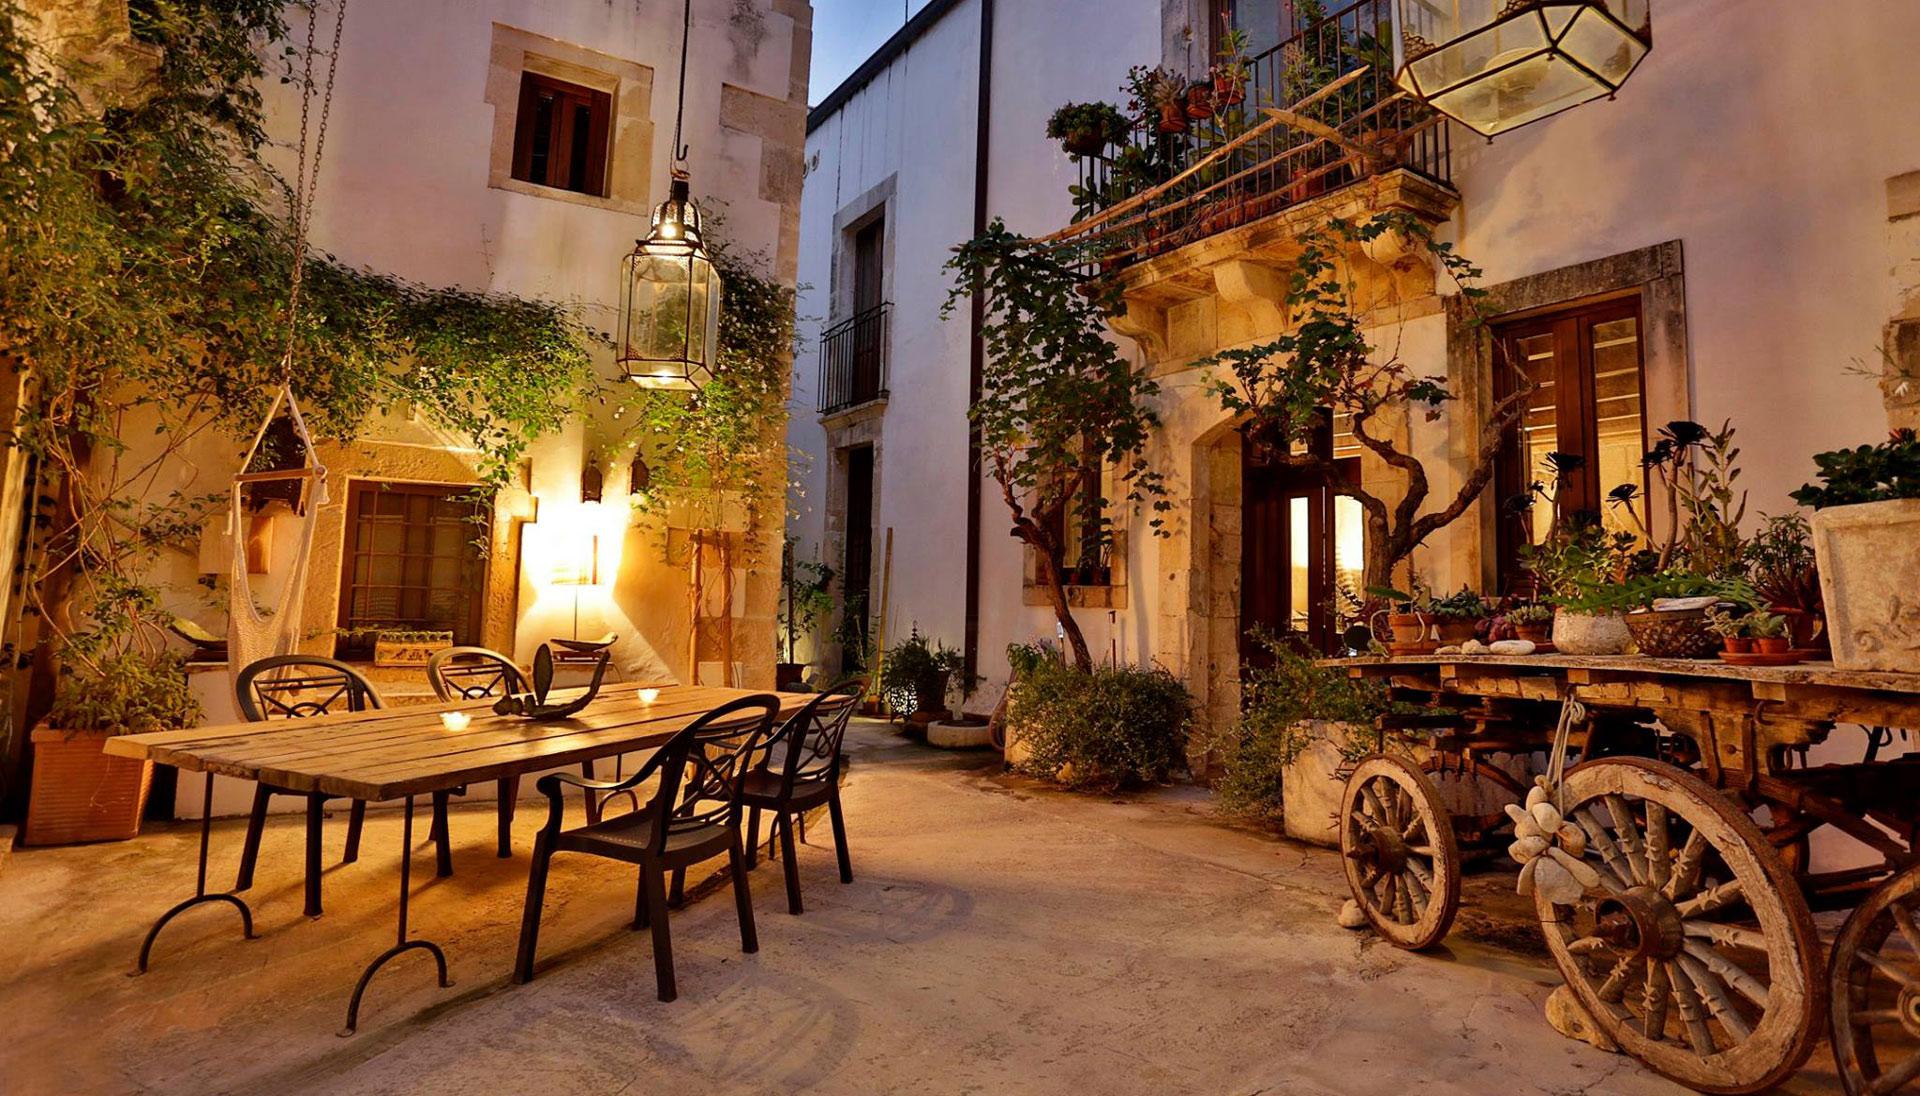 Alla giudecca hotel ortigia siracusa for Hotel siracusa 3 stelle